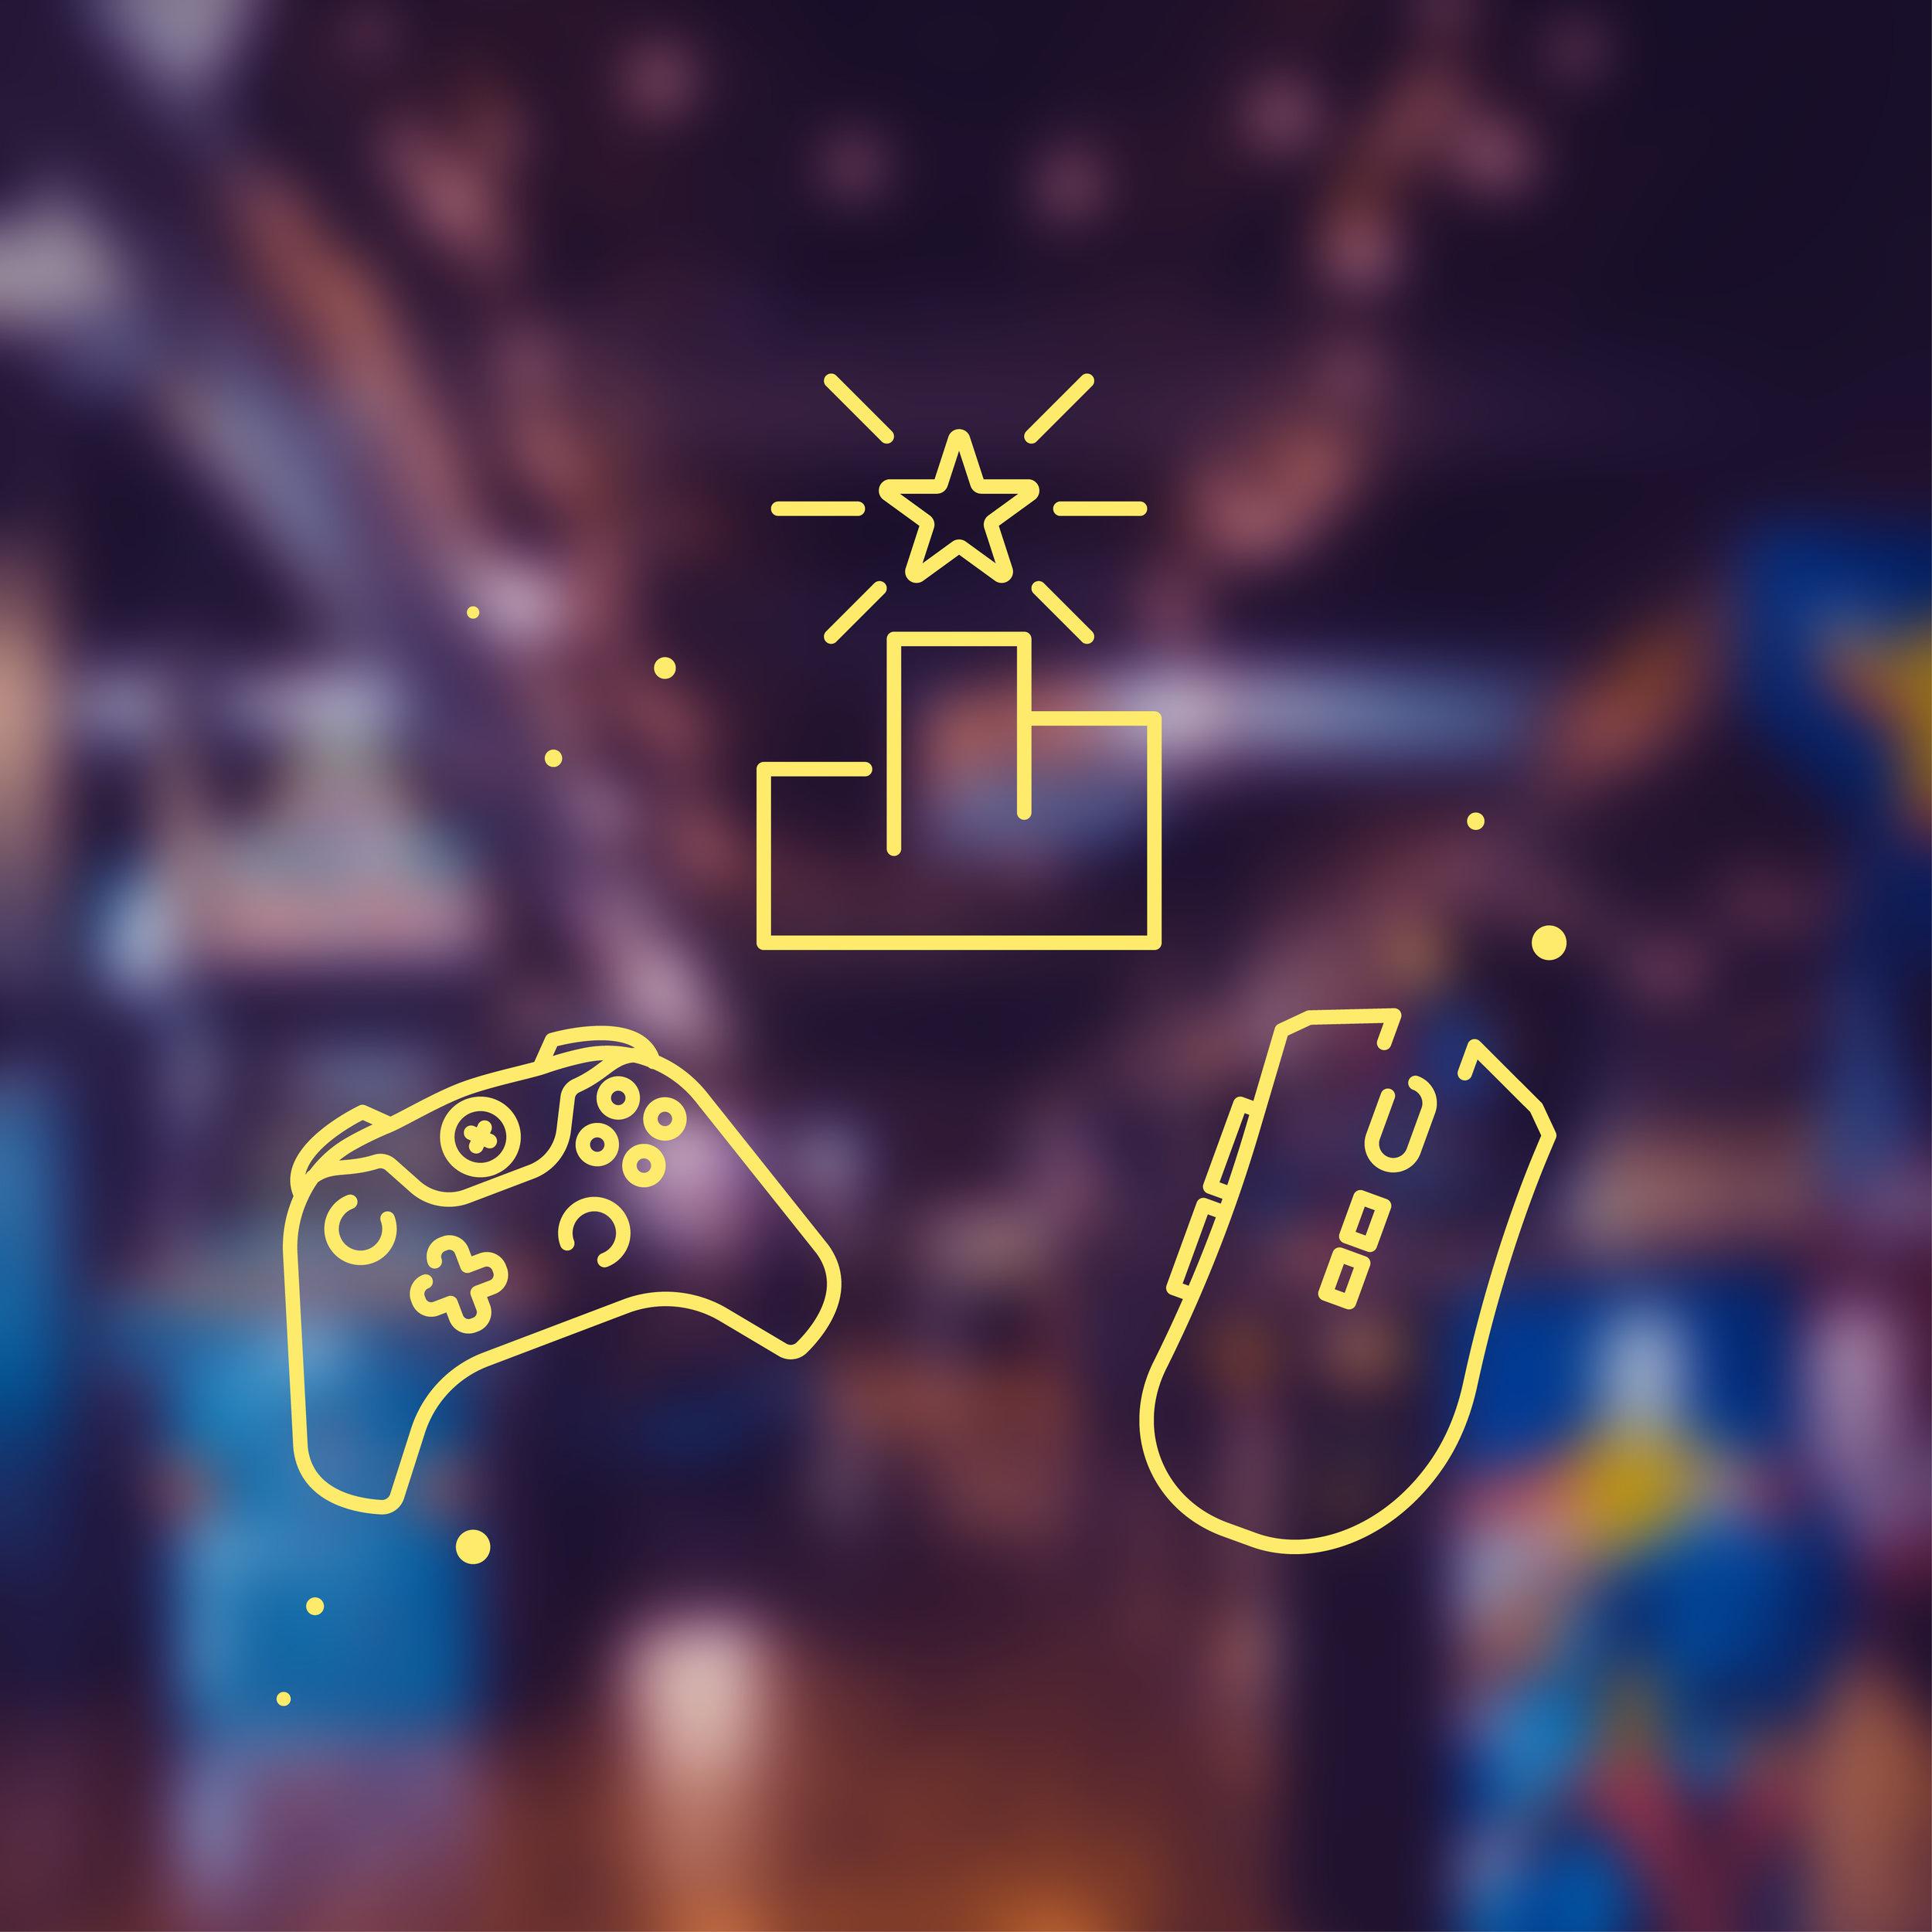 promo 3 icons-01.jpg